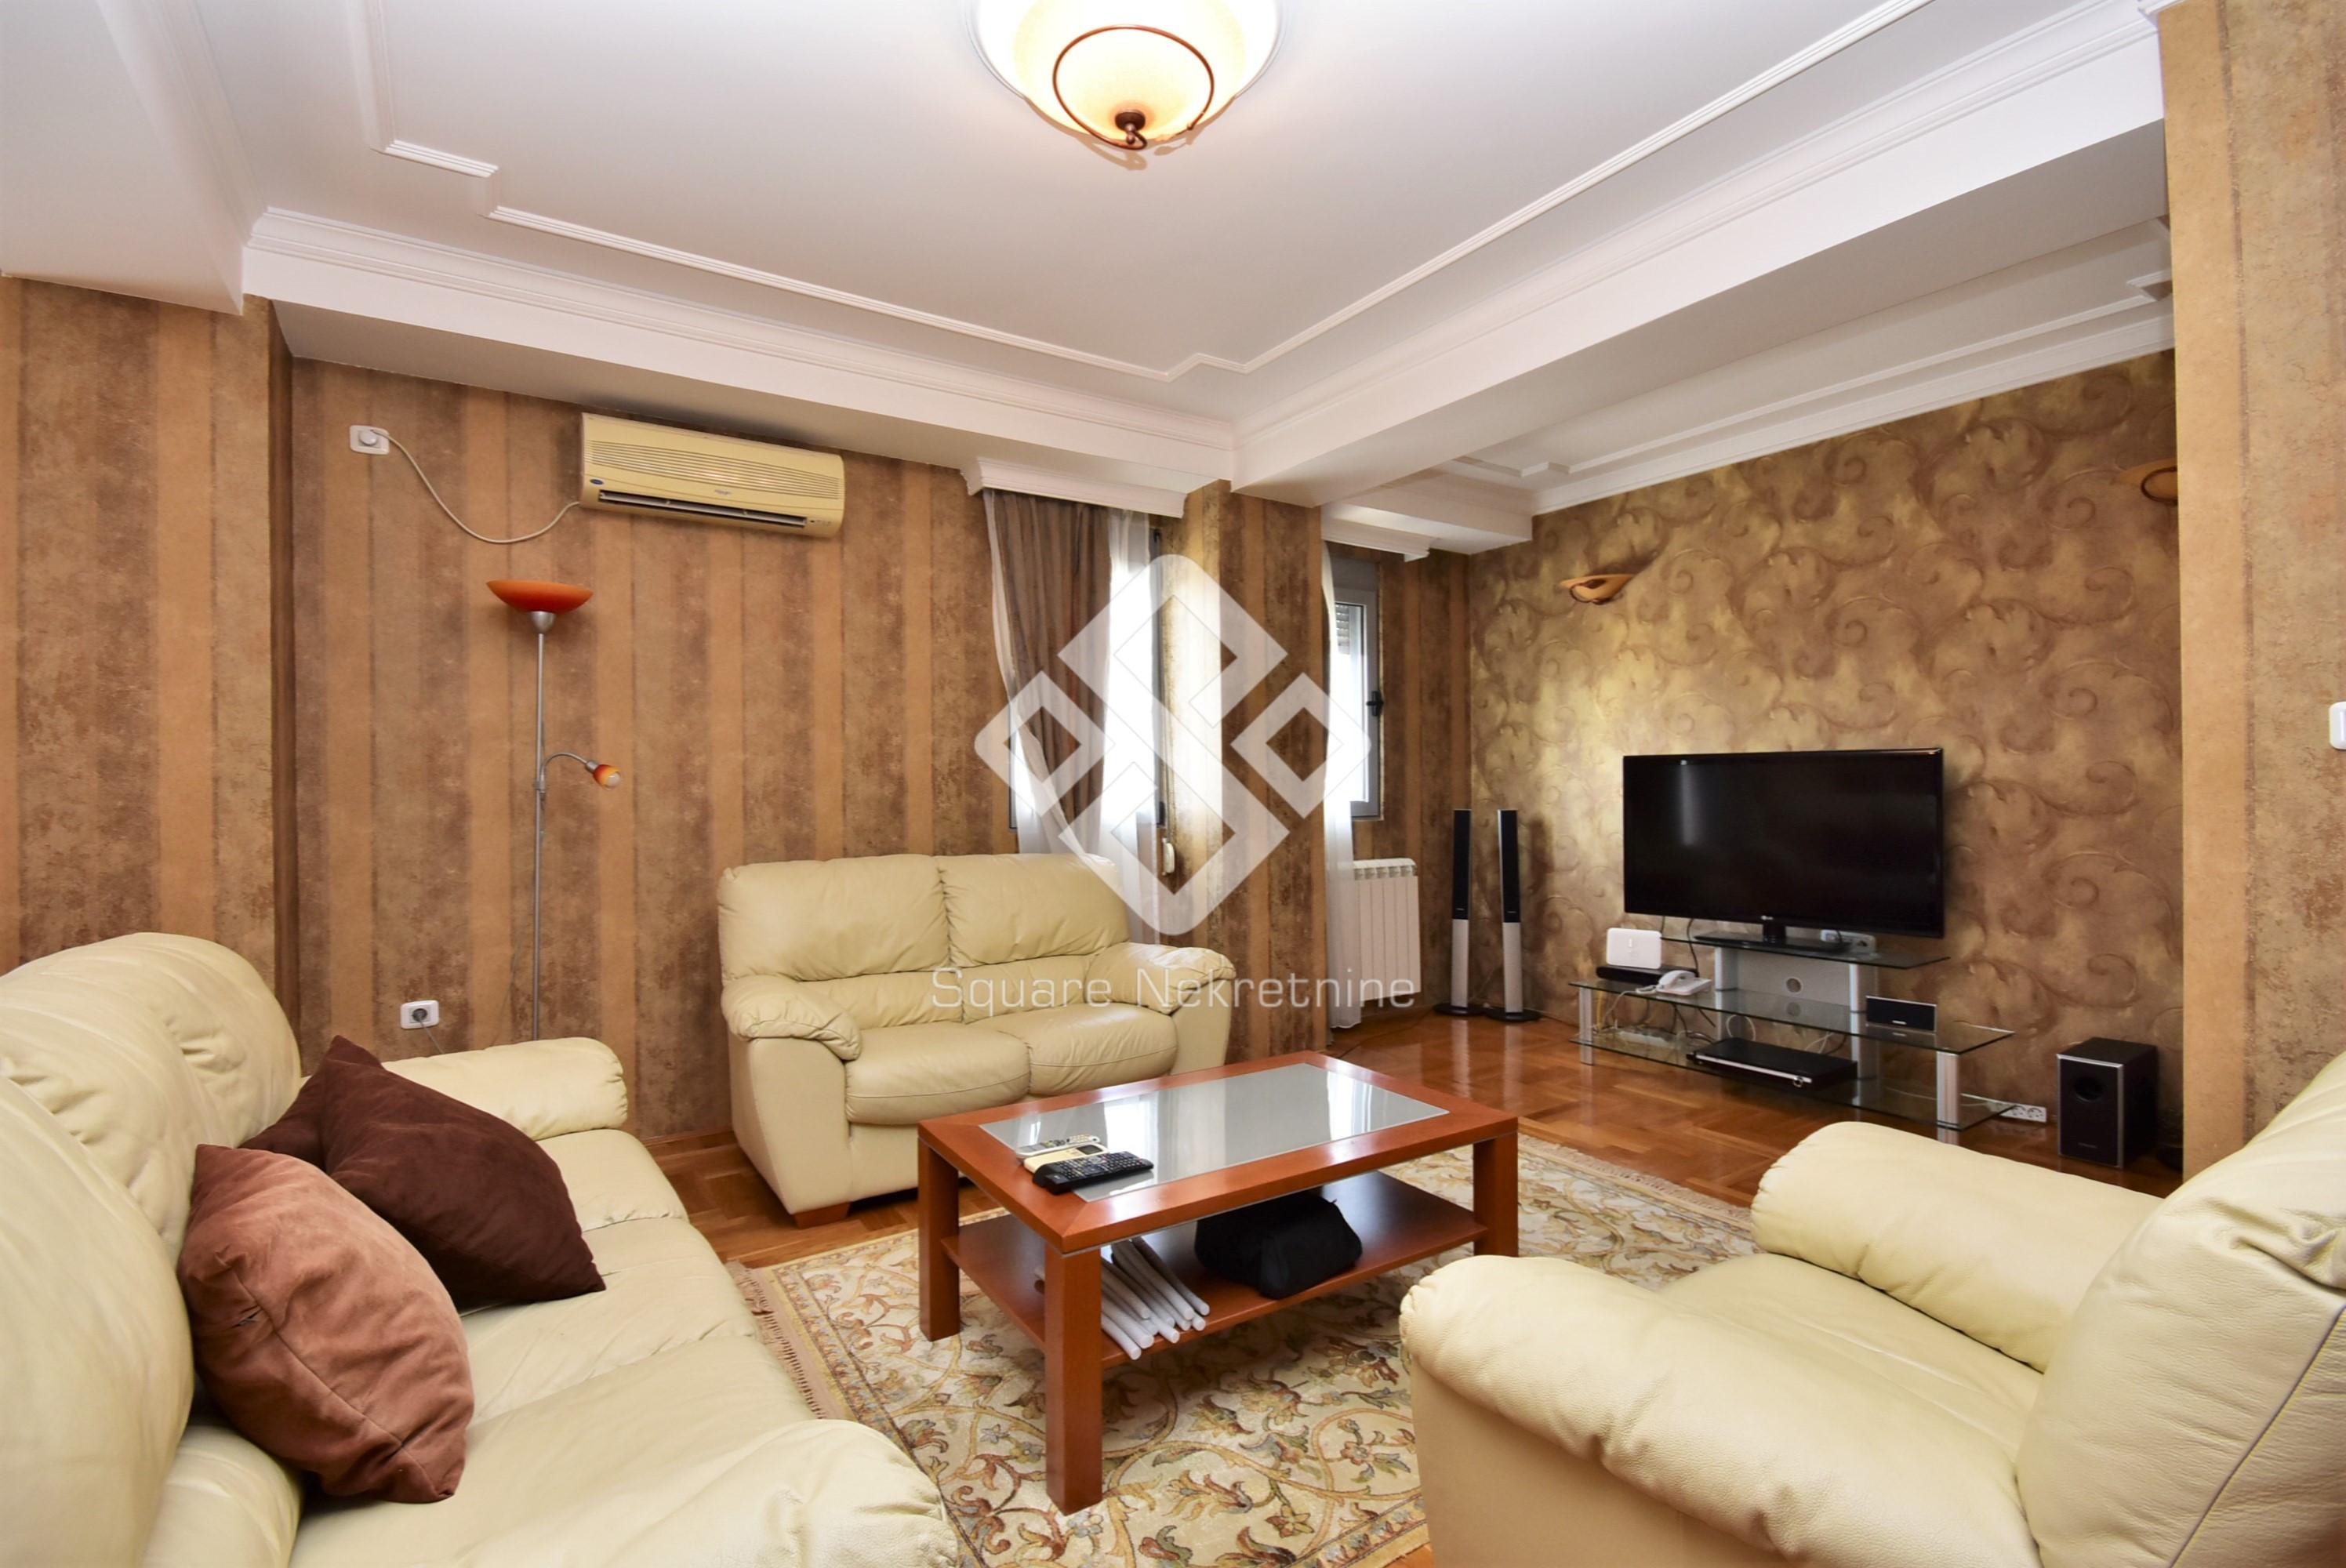 Dvosoban stan 88m2, namjesten + garaza, Gorica C